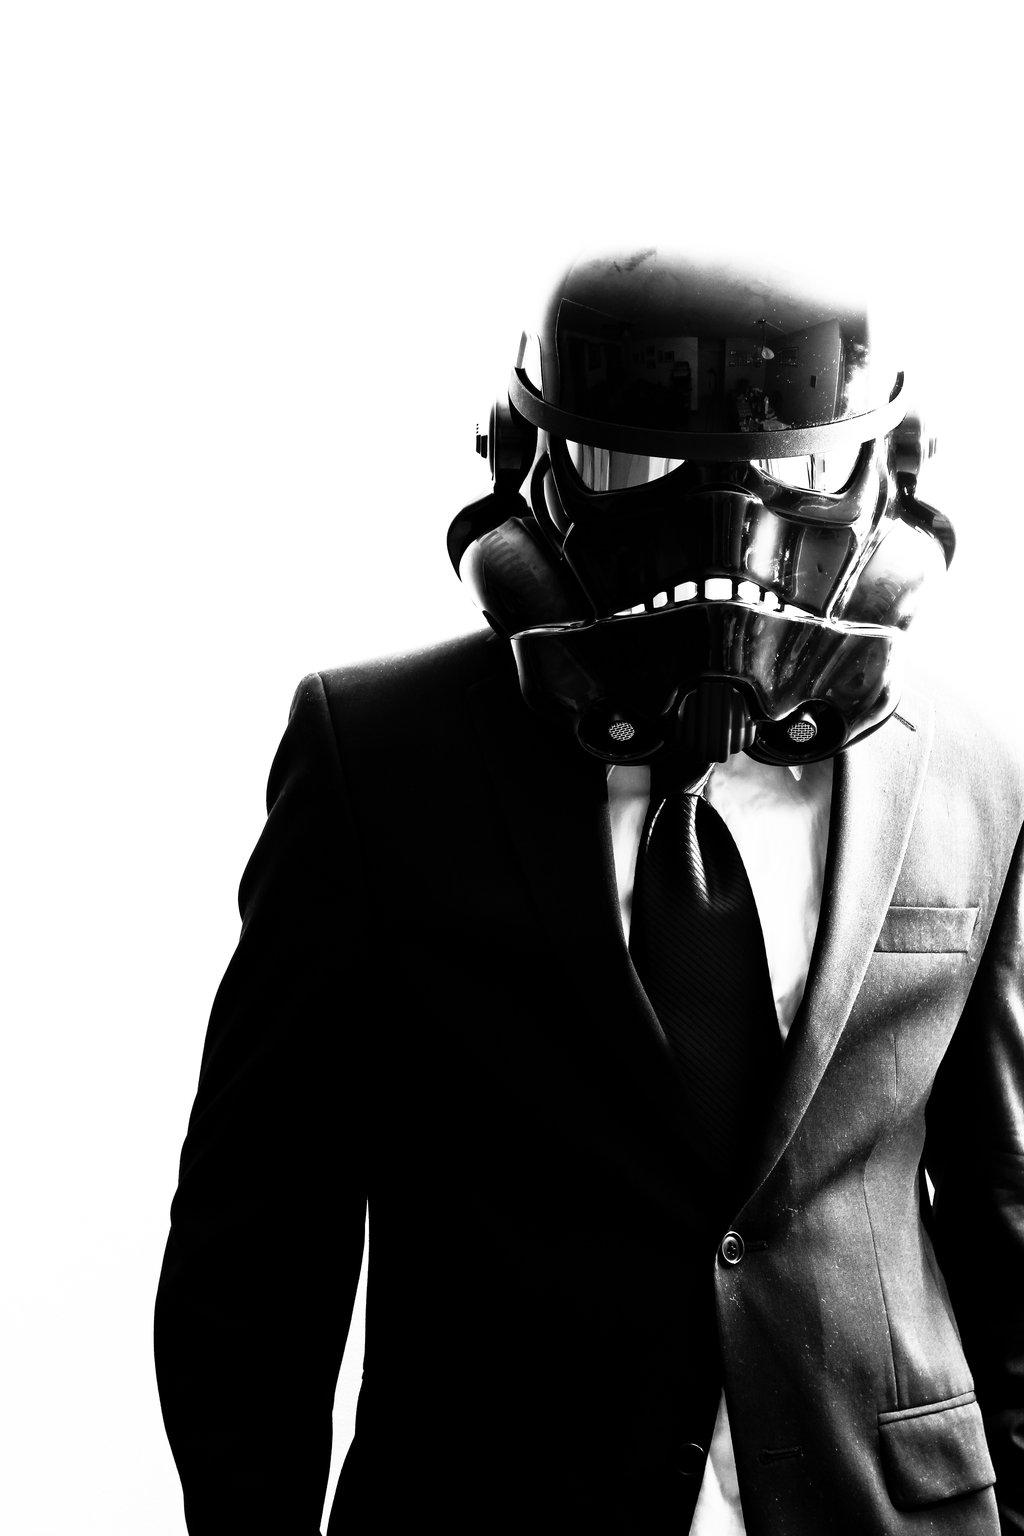 Shadow trooper wallpaper wallpapersafari - Stormtrooper suit wallpaper ...